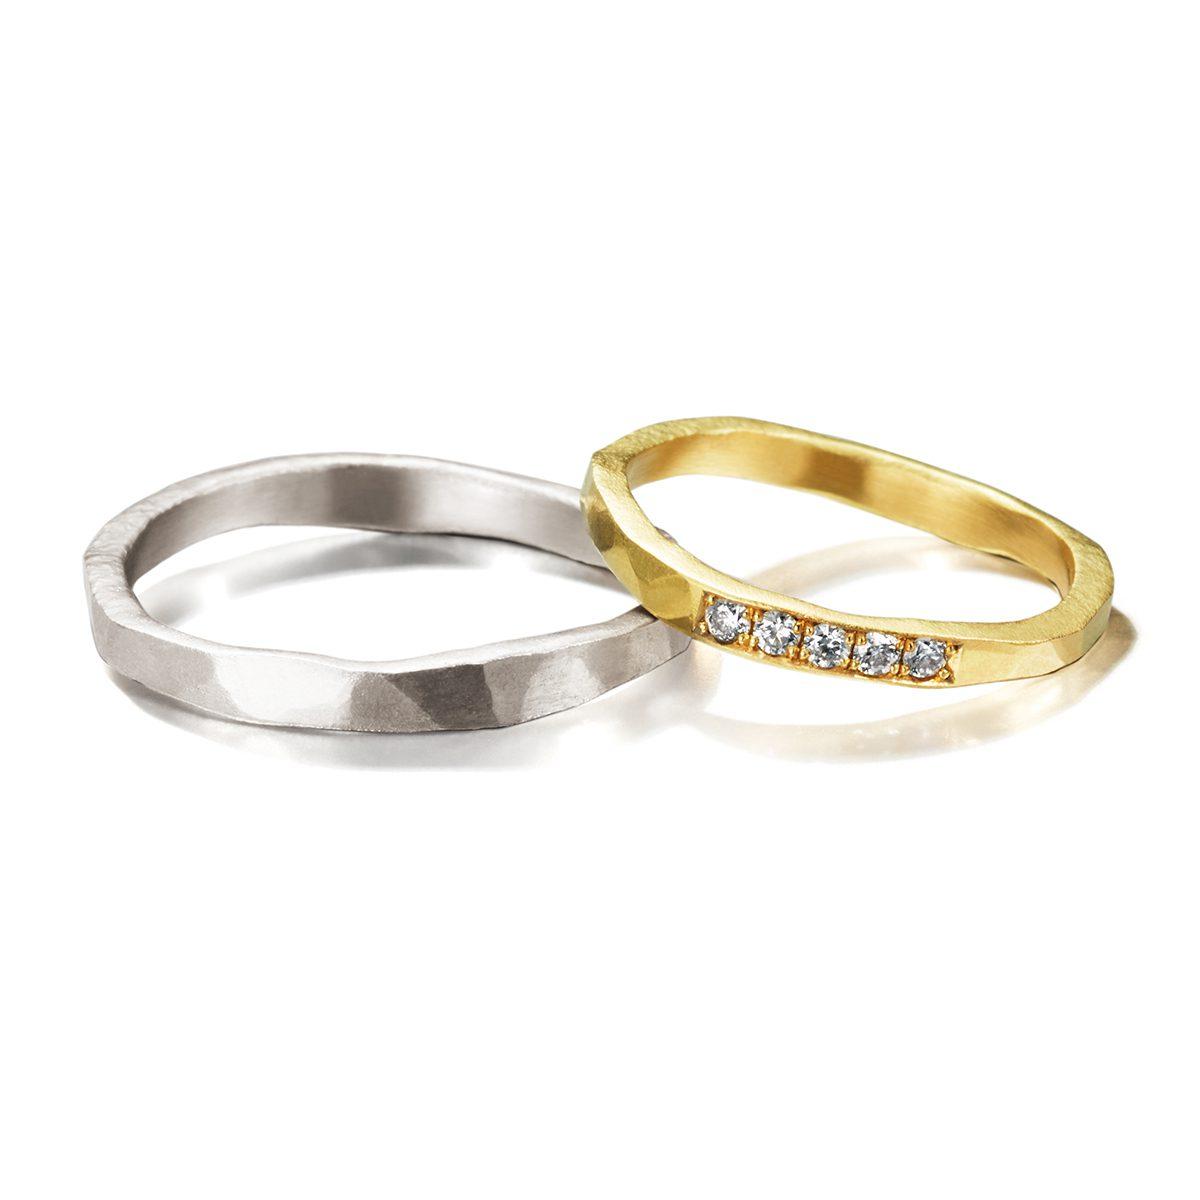 CORINNE HAMAK - Trust Ring Marriage Rings